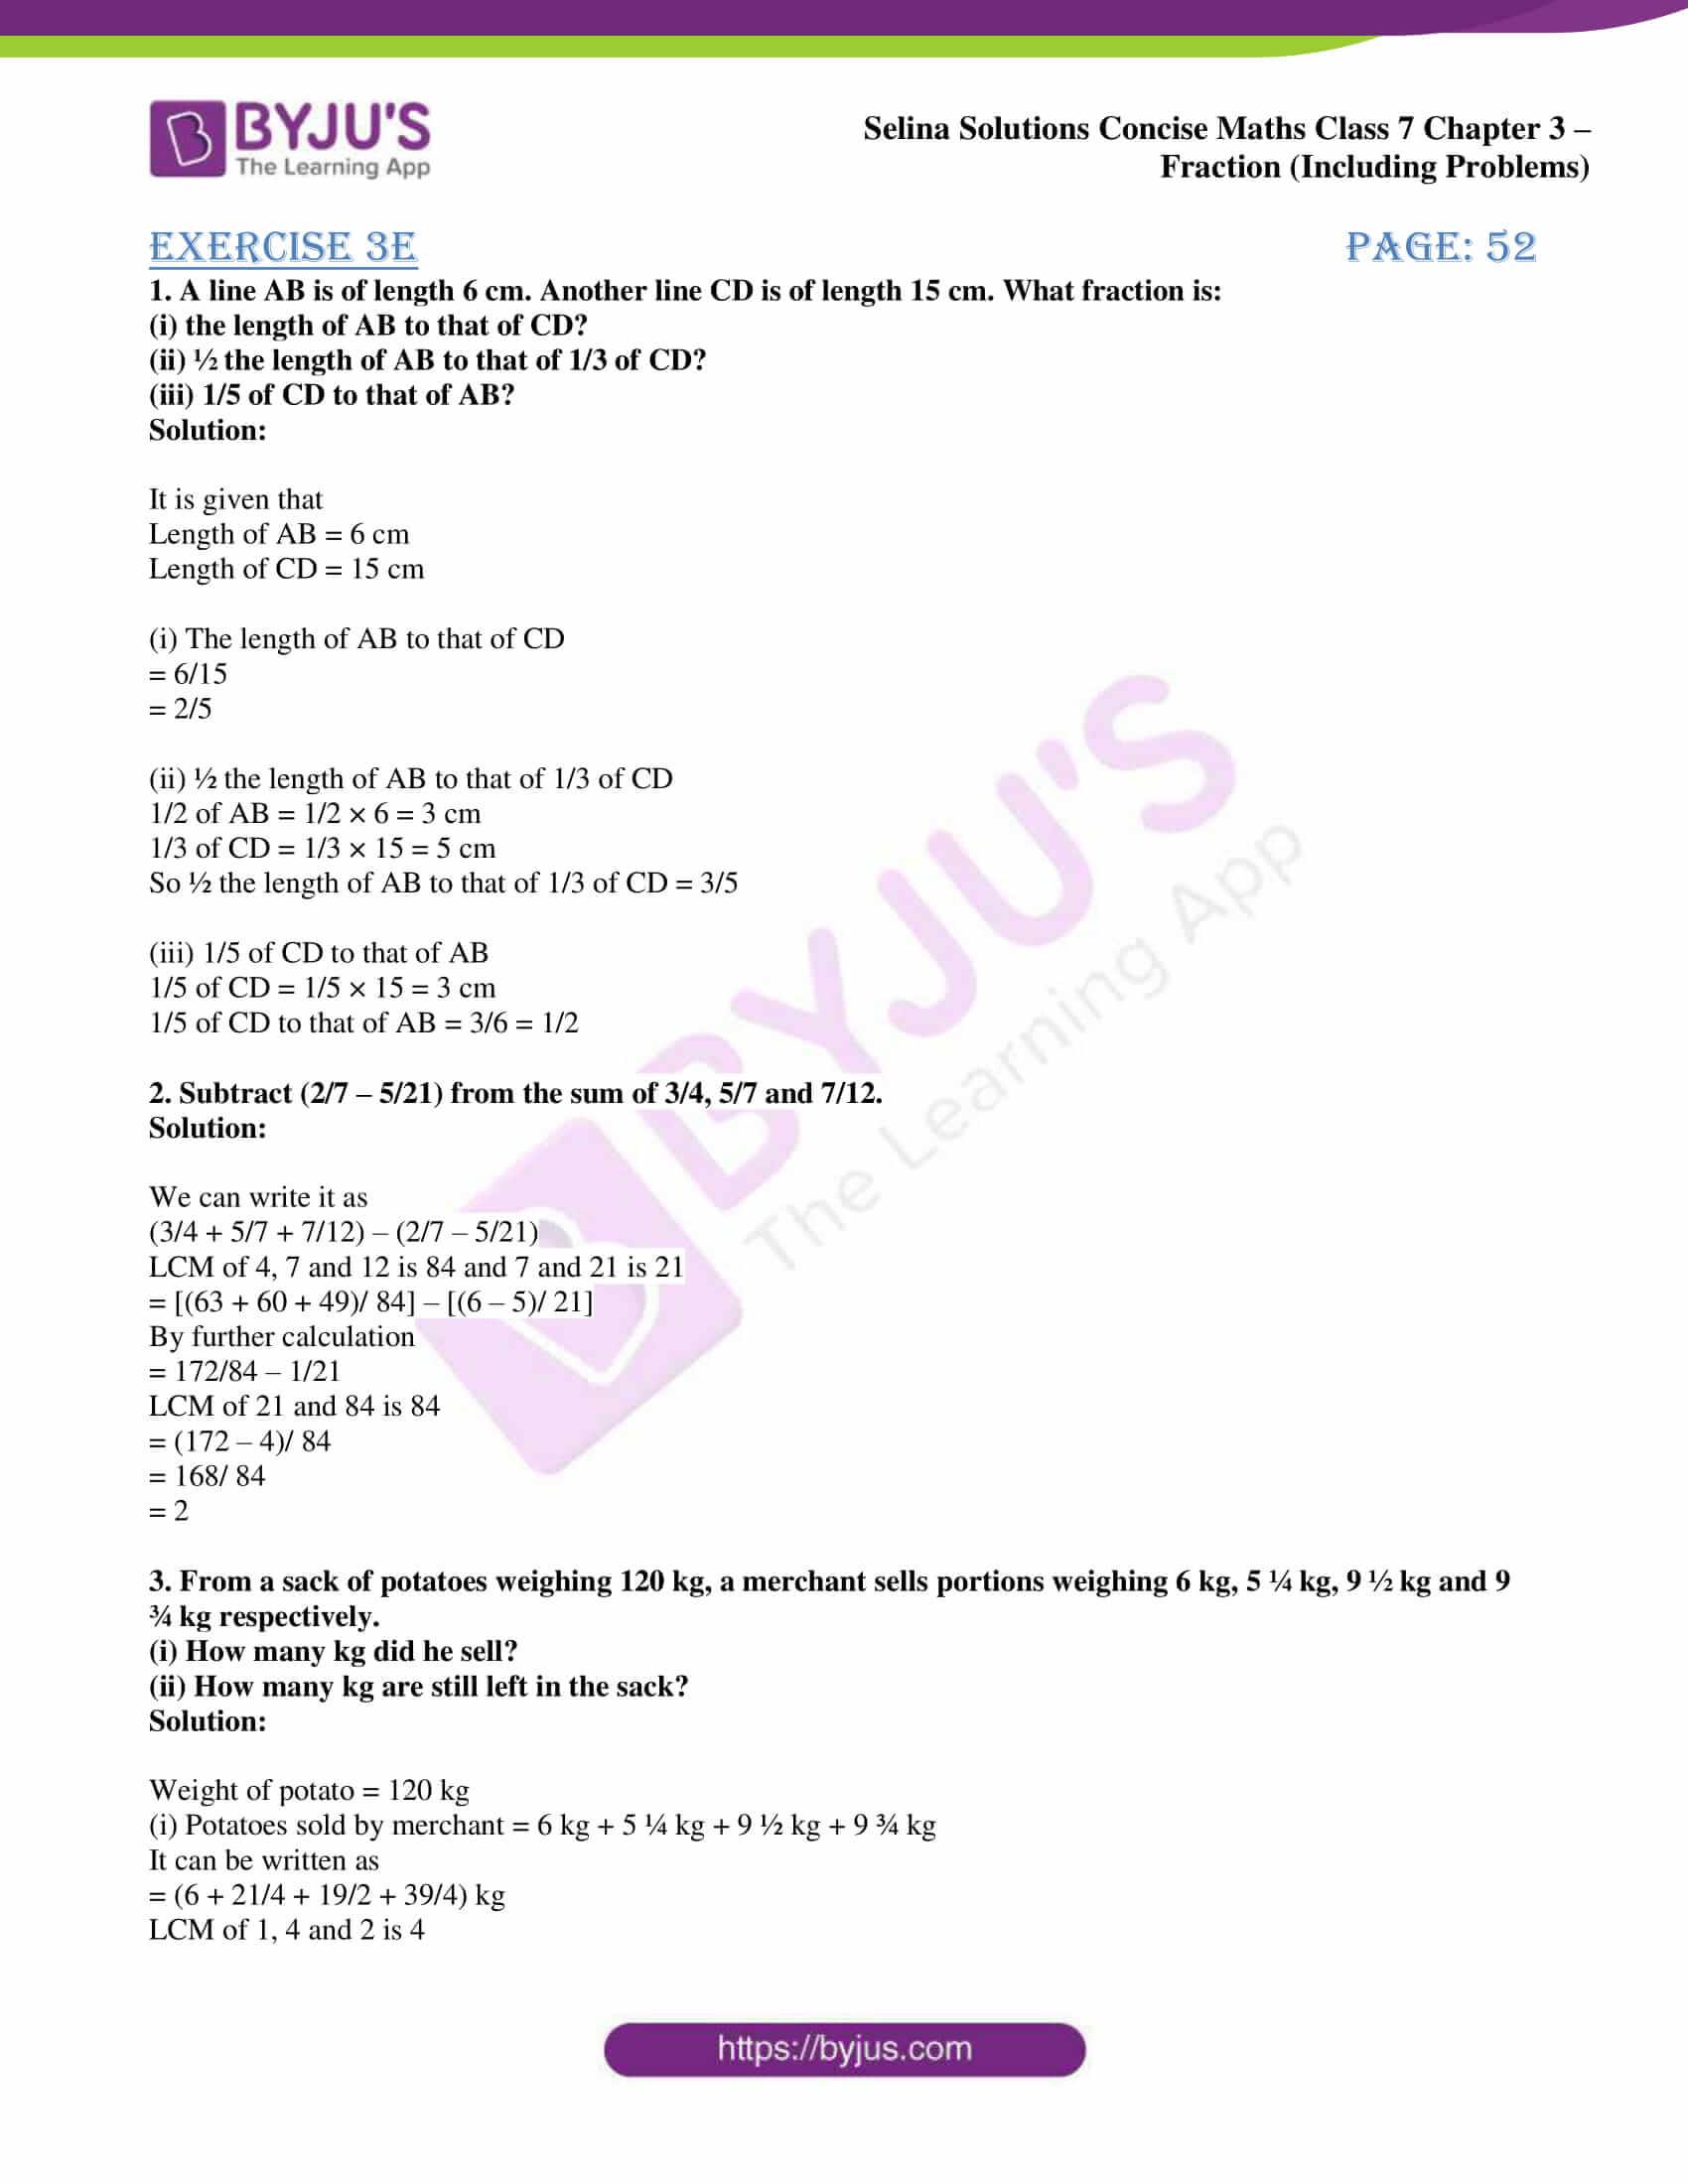 selina sol concise maths class 7 ch3 ex 3e 1